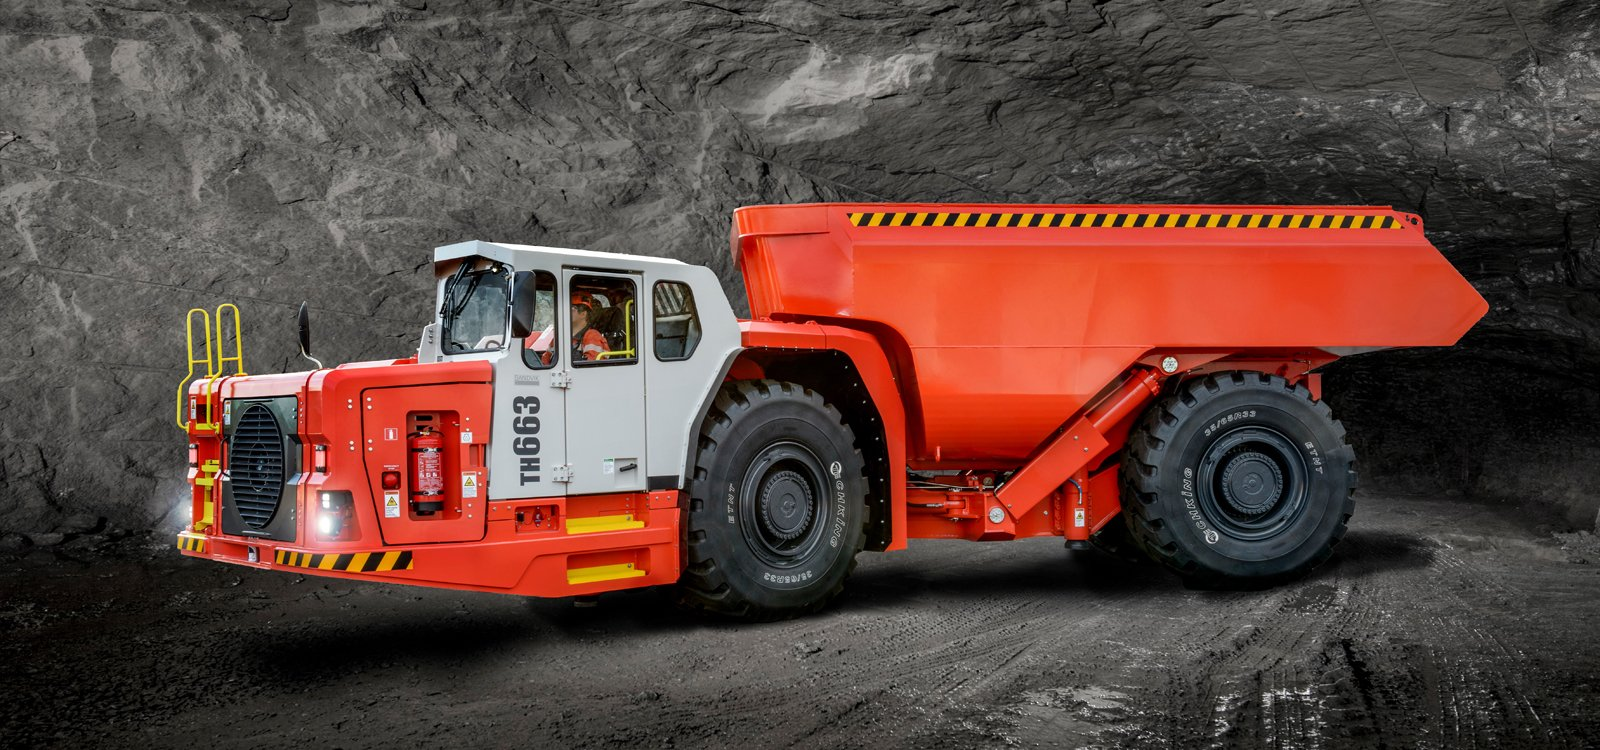 <p>澳大利亚FMR Investments在为其Eloise矿山购置一批全新卡车时,选择了山特维克的融资方案。</p>